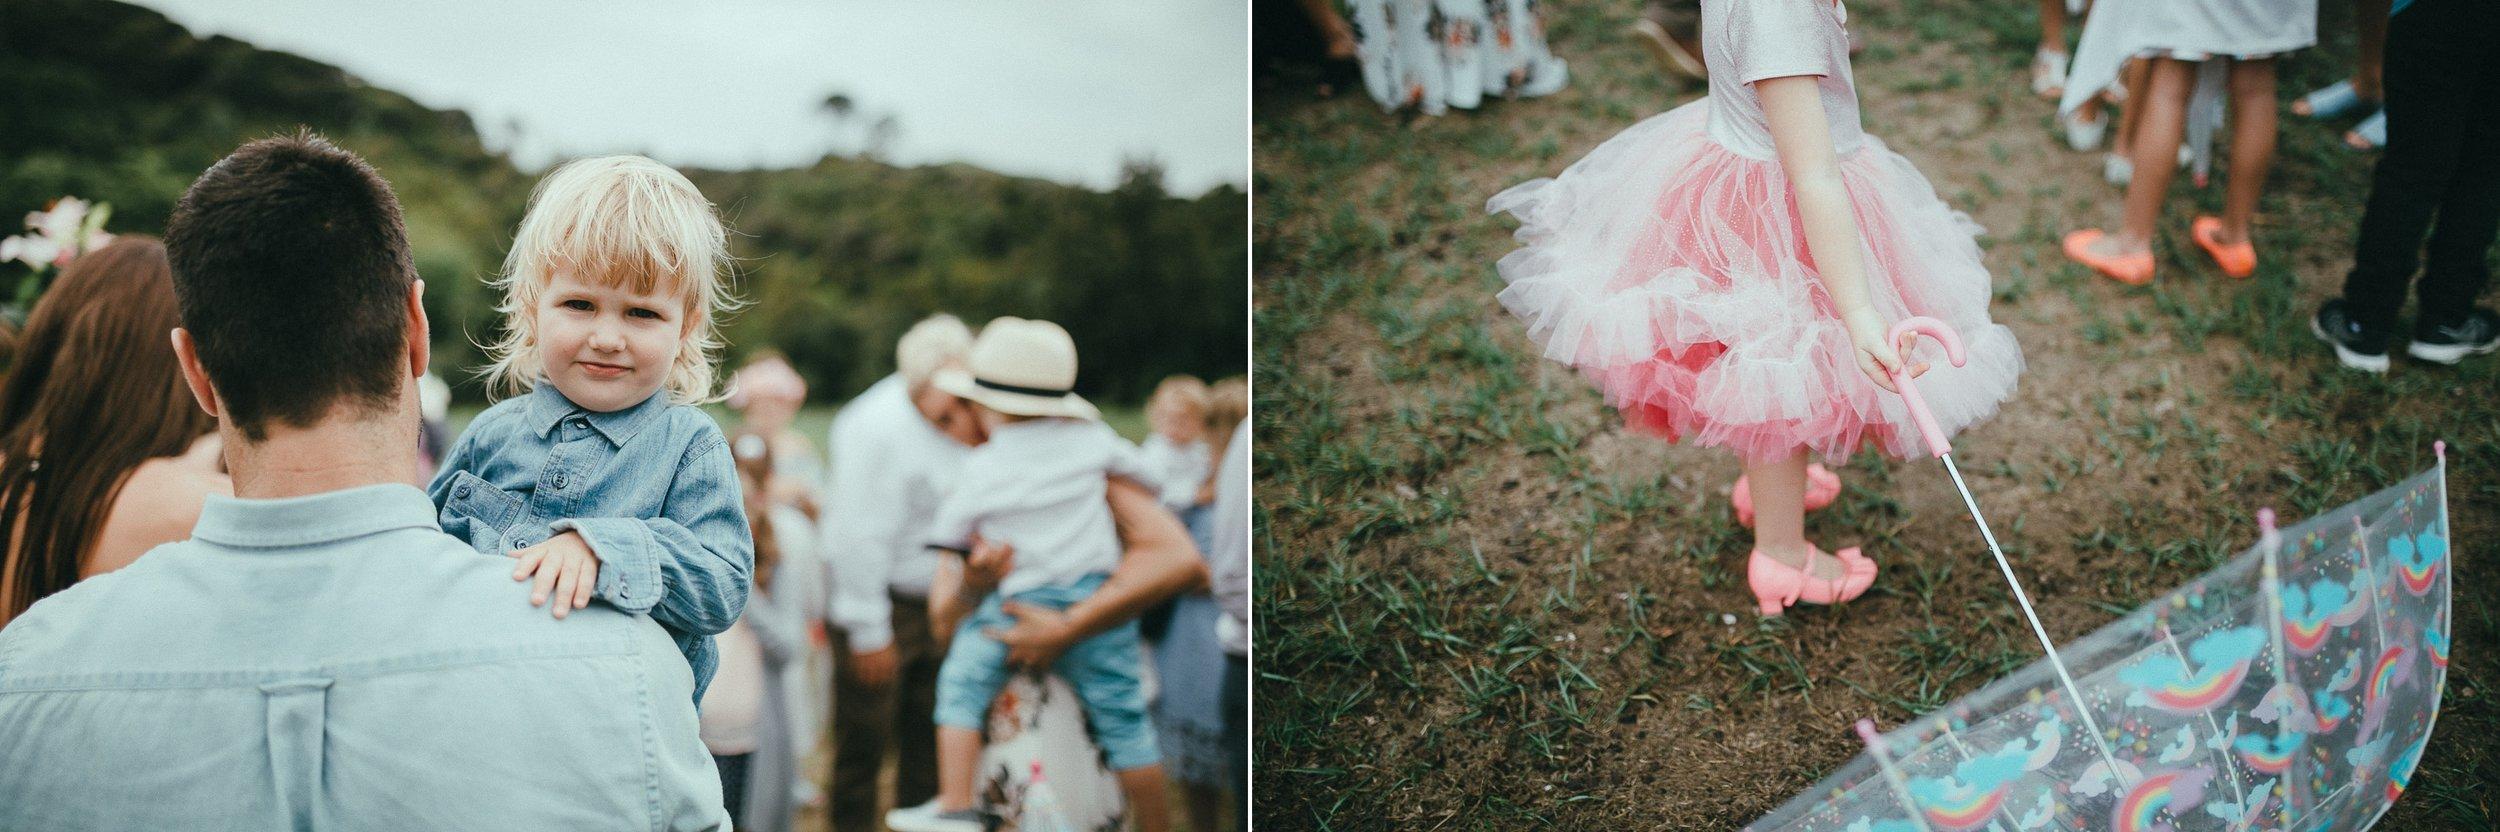 emotional-wedding-new-zealand91.jpg